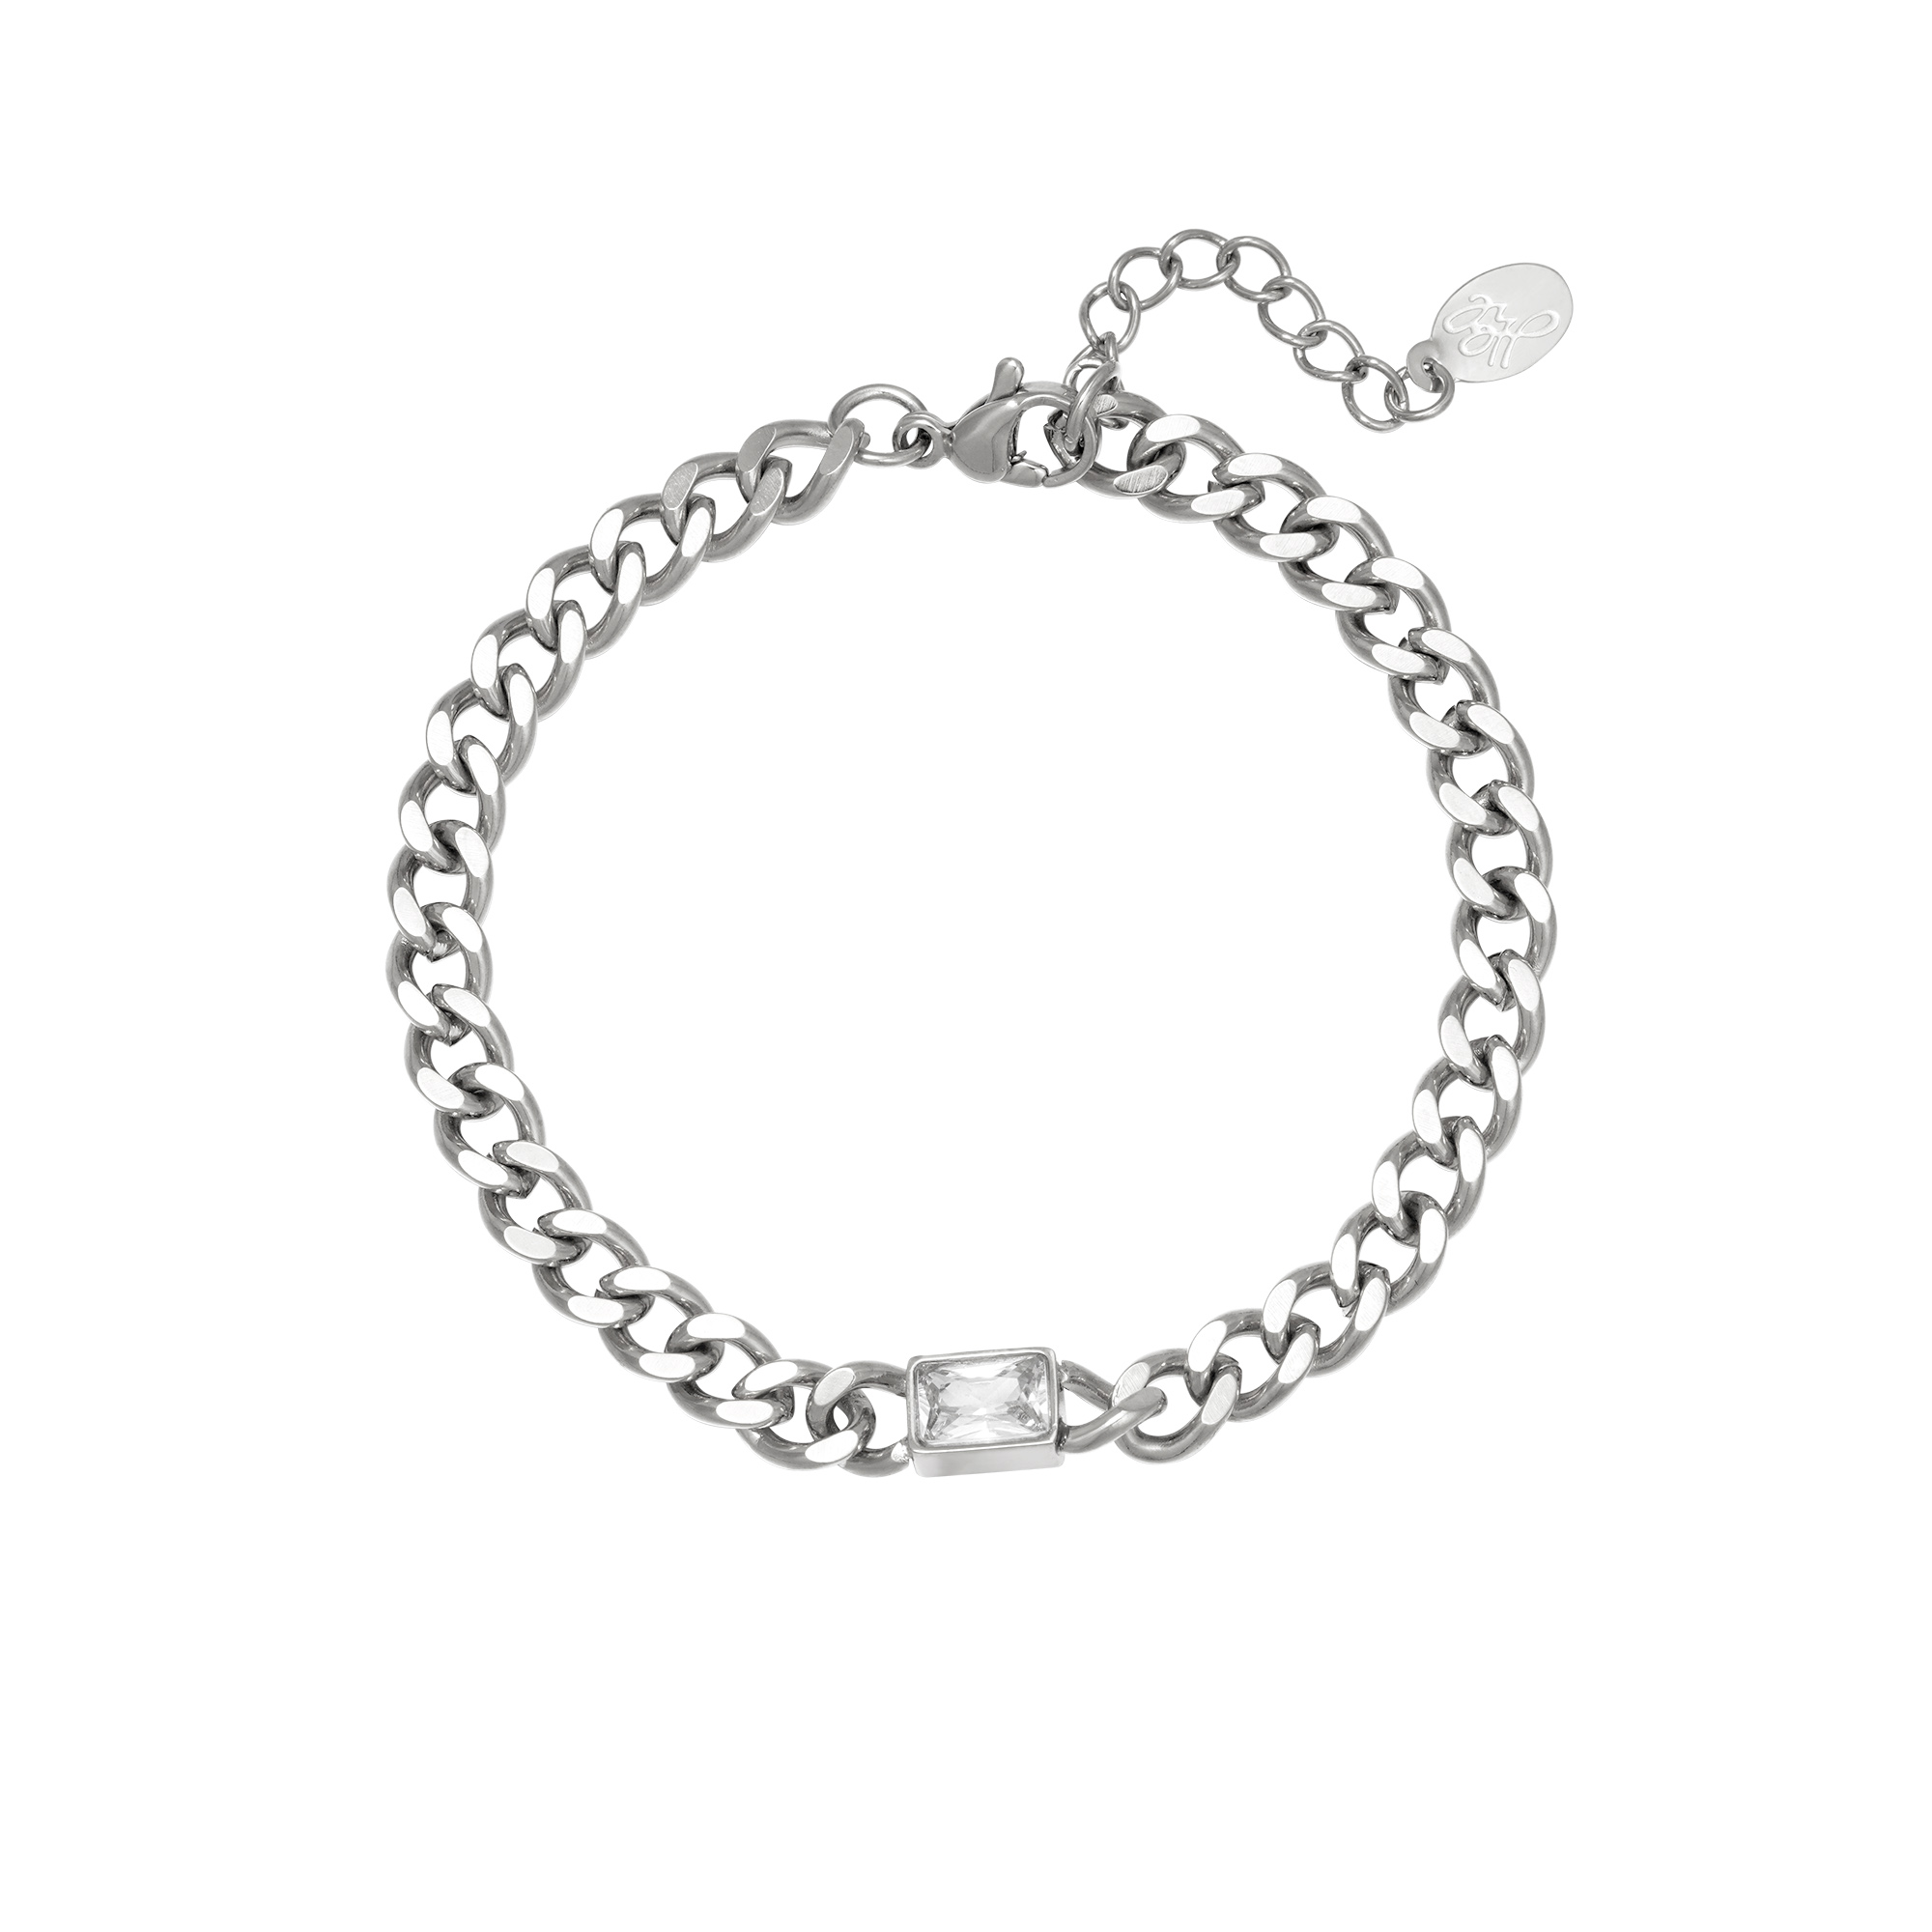 Bracelet Diamond In Chain